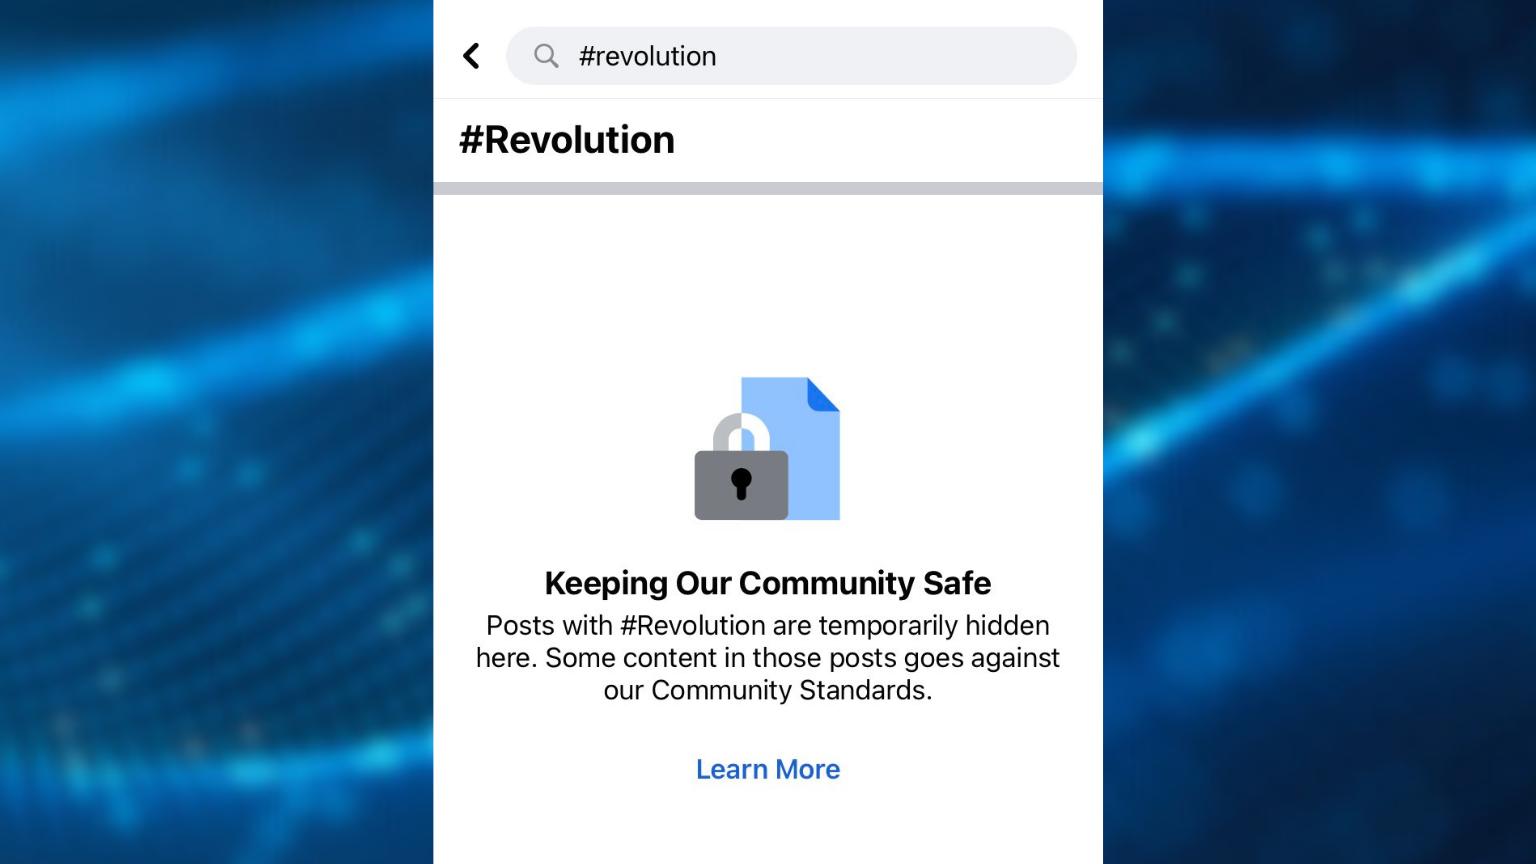 Facebook blocks #Revolution hashtag on July 4th weekend